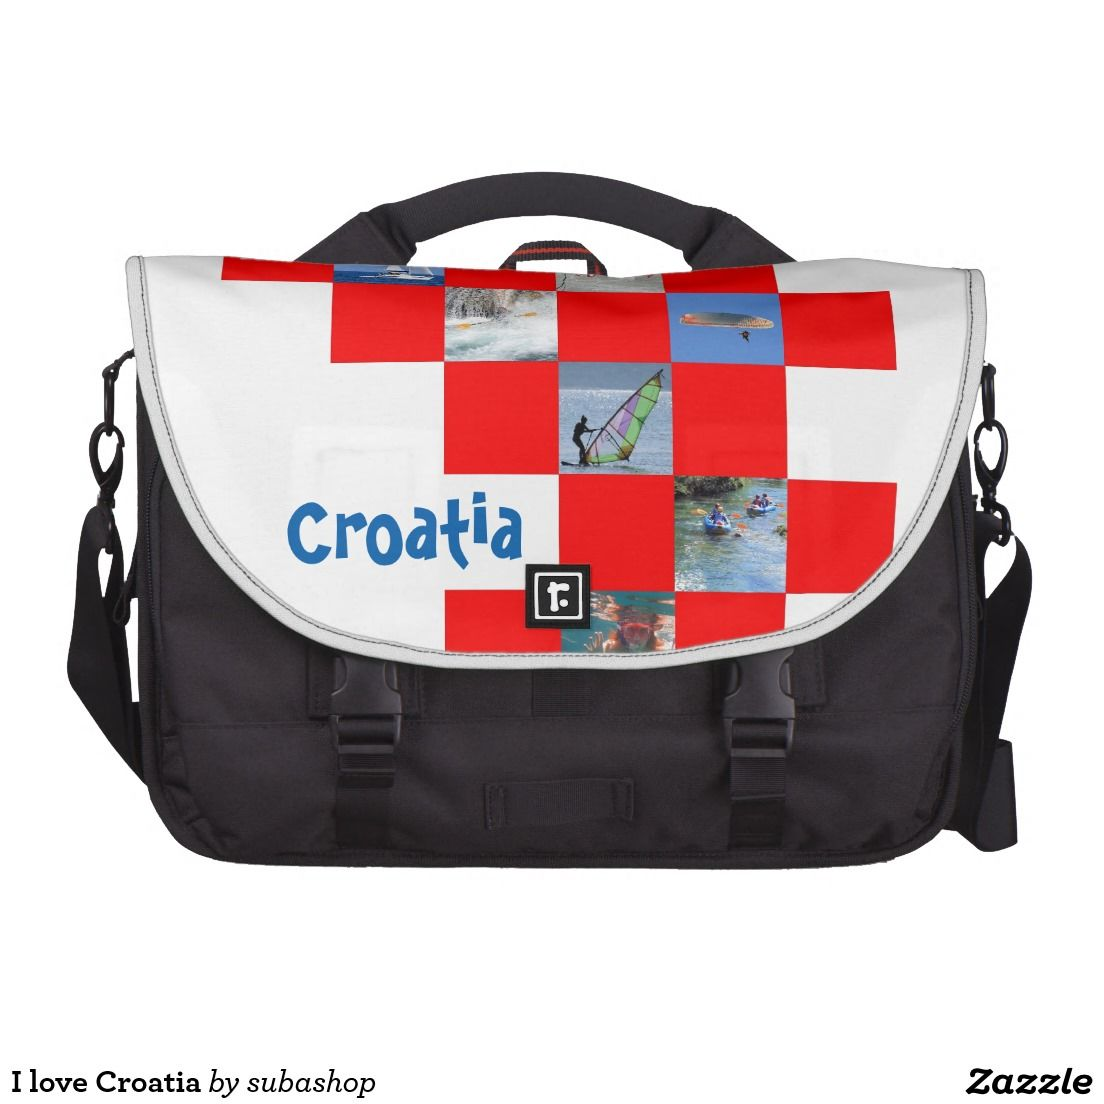 Croatia, Kroatie, gadgets, produkten, souvenirs, I love Croatia, bag, schoolbag,I love Croatia Tassen Voor Laptops, satchel